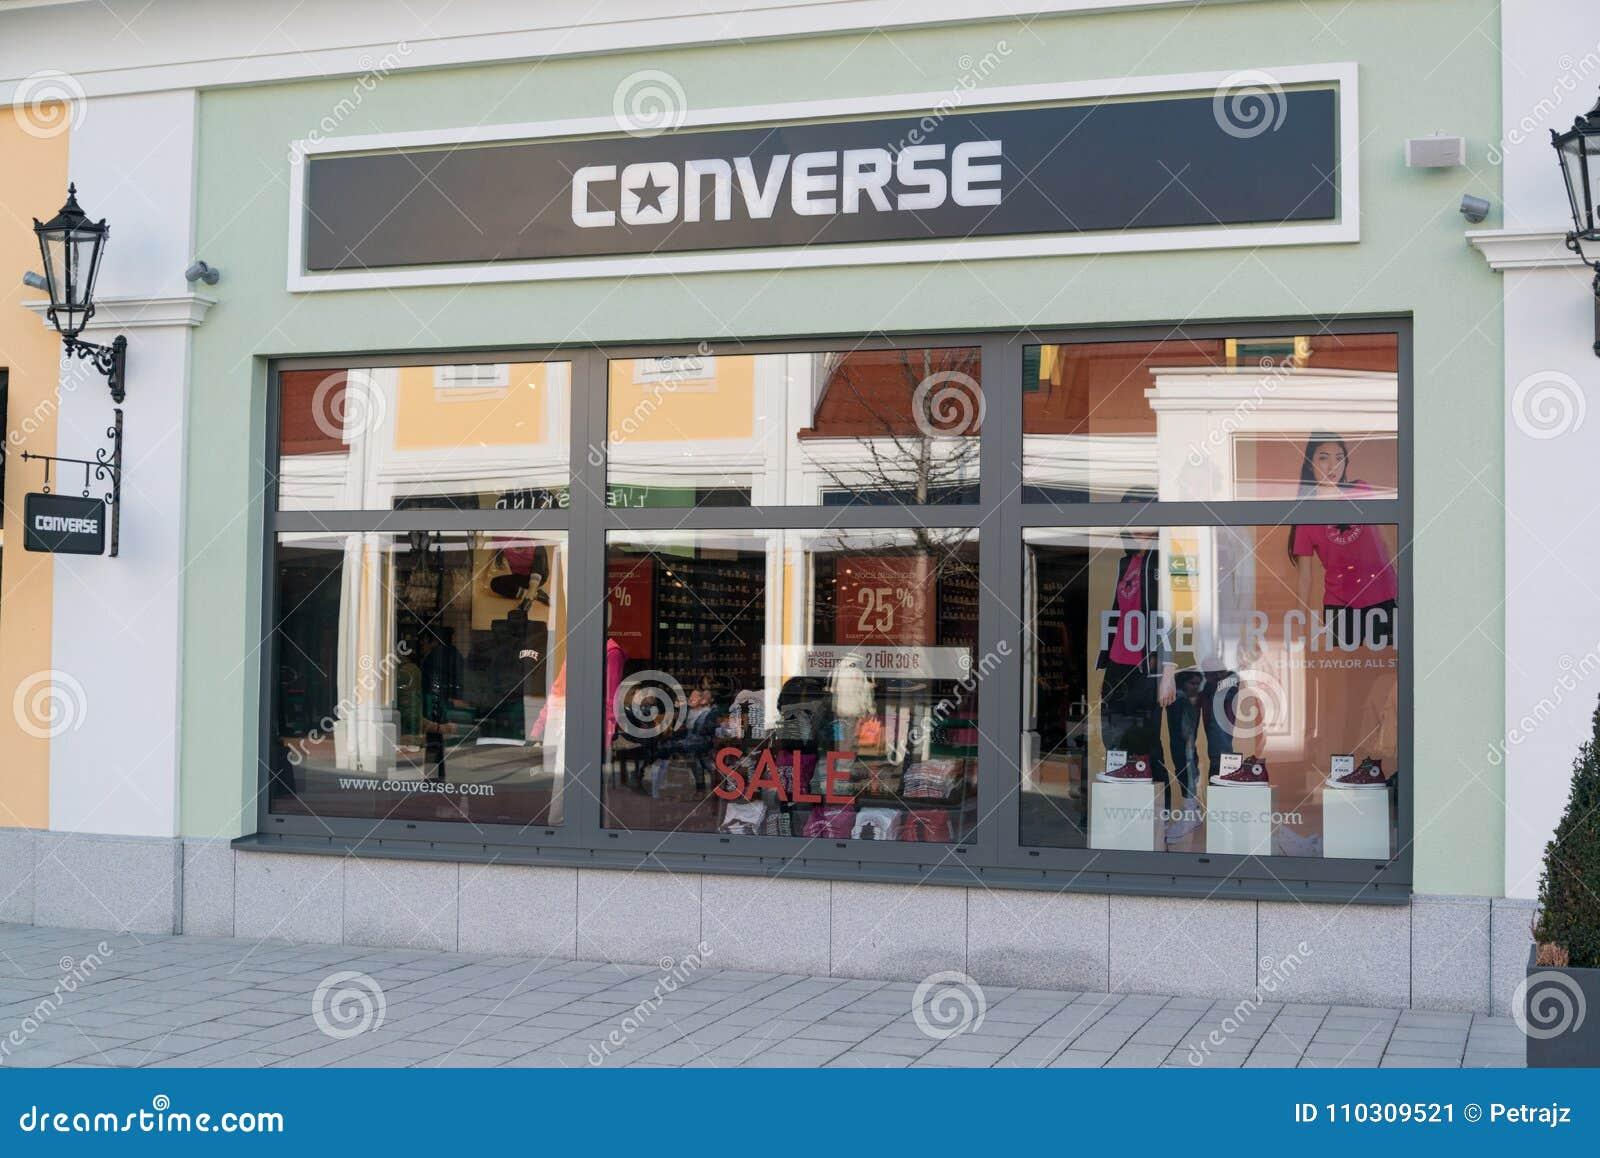 Converse Store In Parndorf, Austria